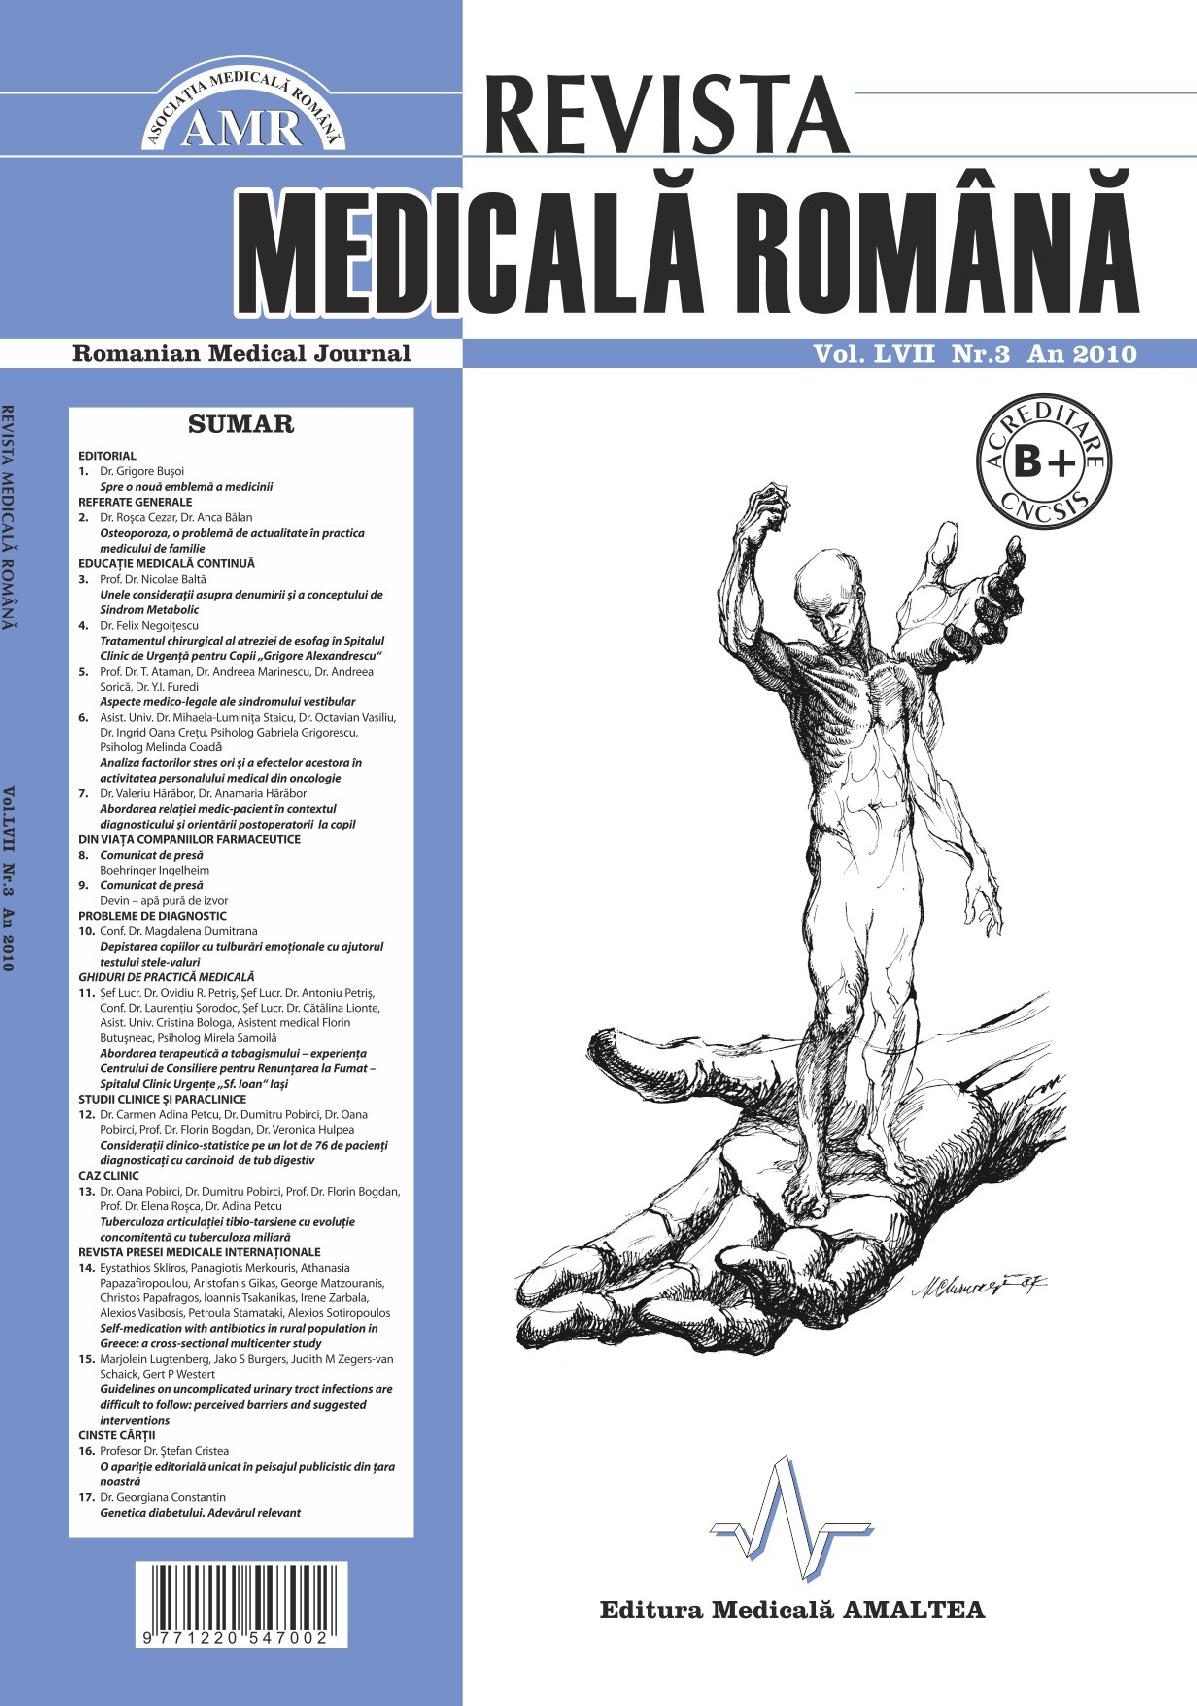 REVISTA MEDICALA ROMANA - Romanian Medical Journal, Vol. LVII, Nr. 3, An 2010